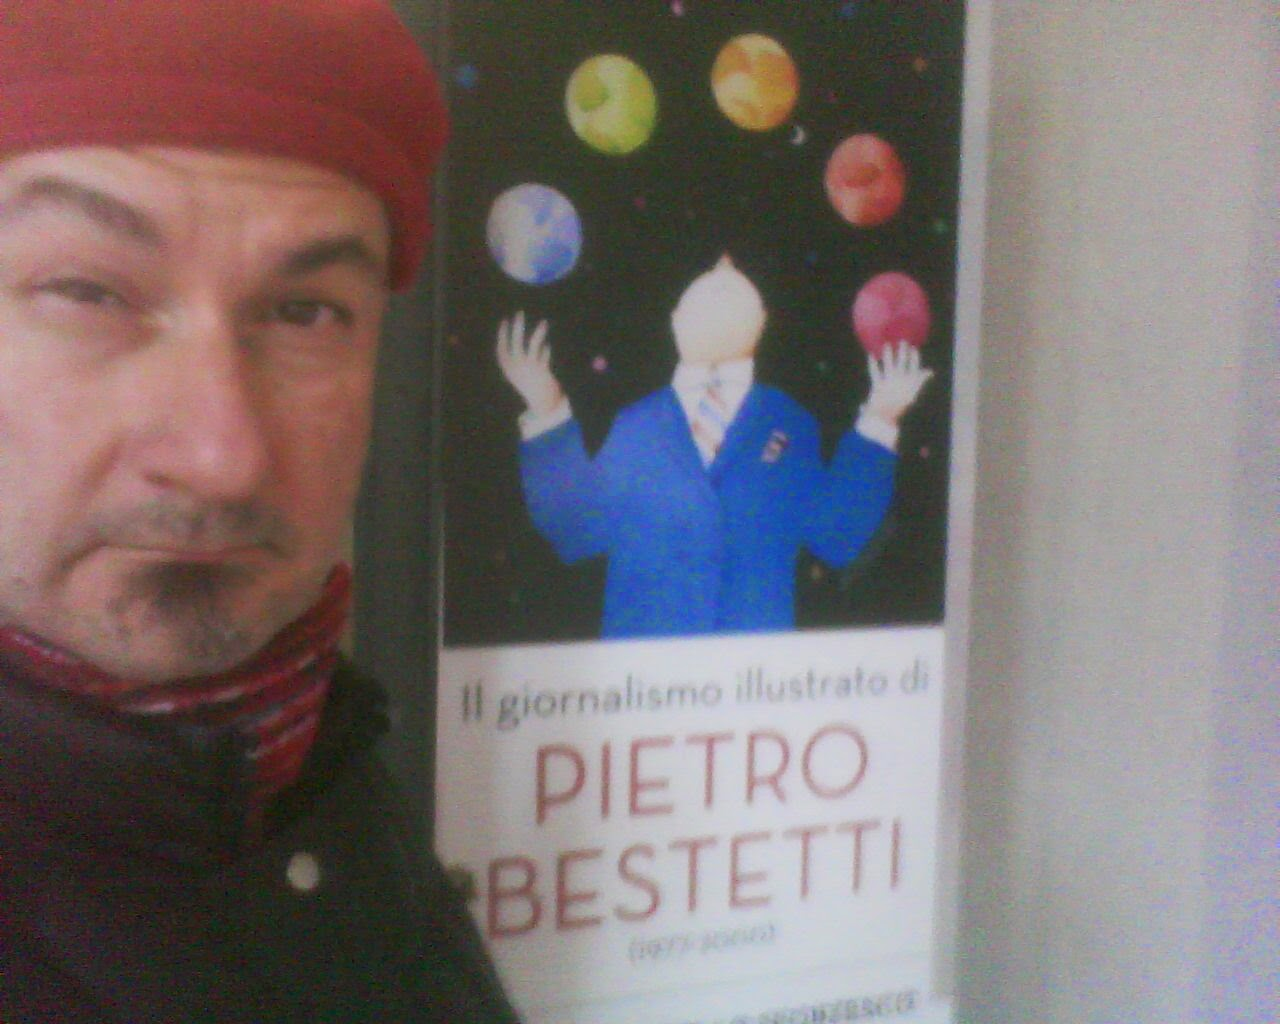 EXHIBITION  OFCARTOONIST PIETRO  BESTIATI  IN  CASTELO  SFORZA